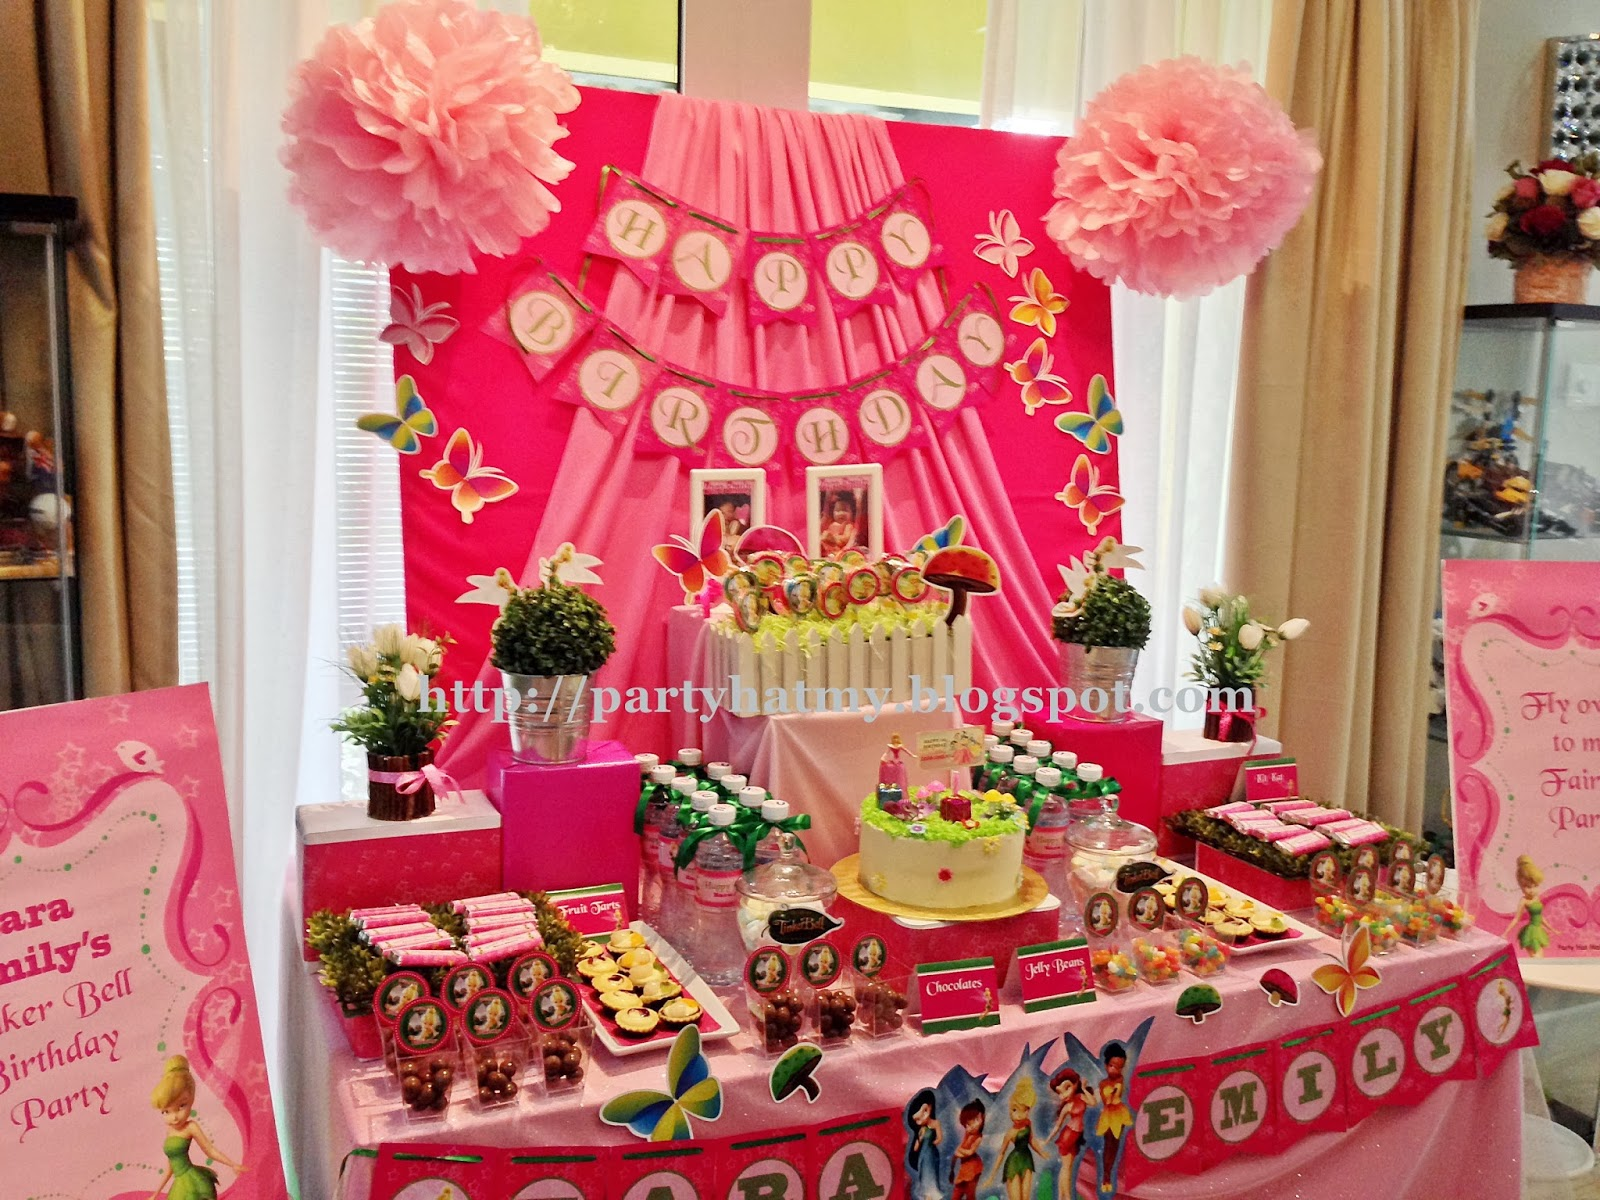 St Birthday Cake Design In Malaysia